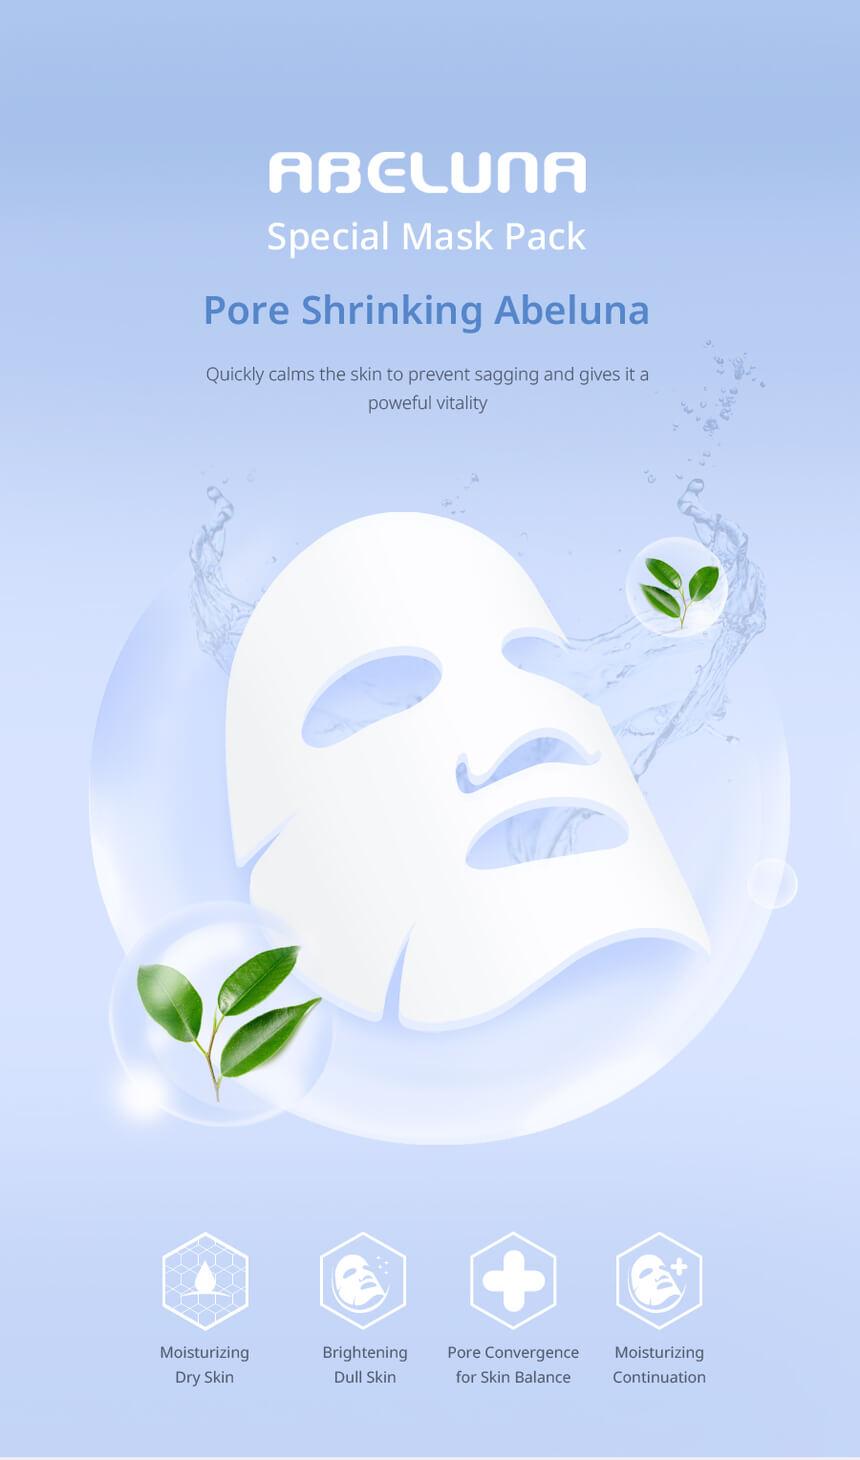 Abeluna aqua-peel mask packs, 10 to 100 1